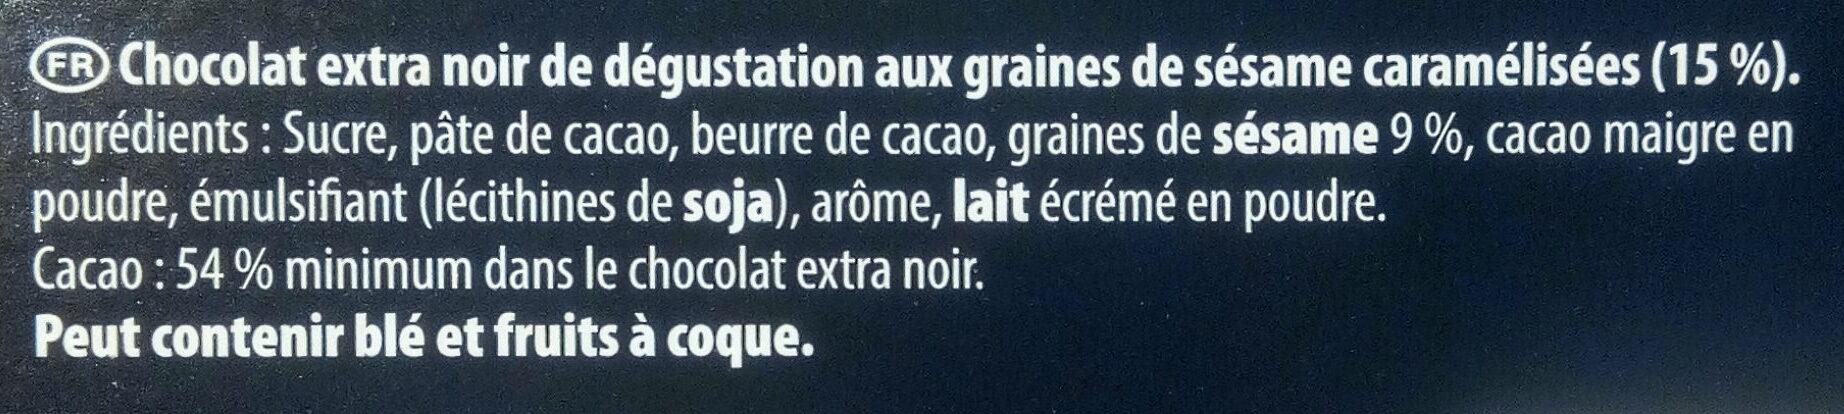 Sésame Noir - Ingredients